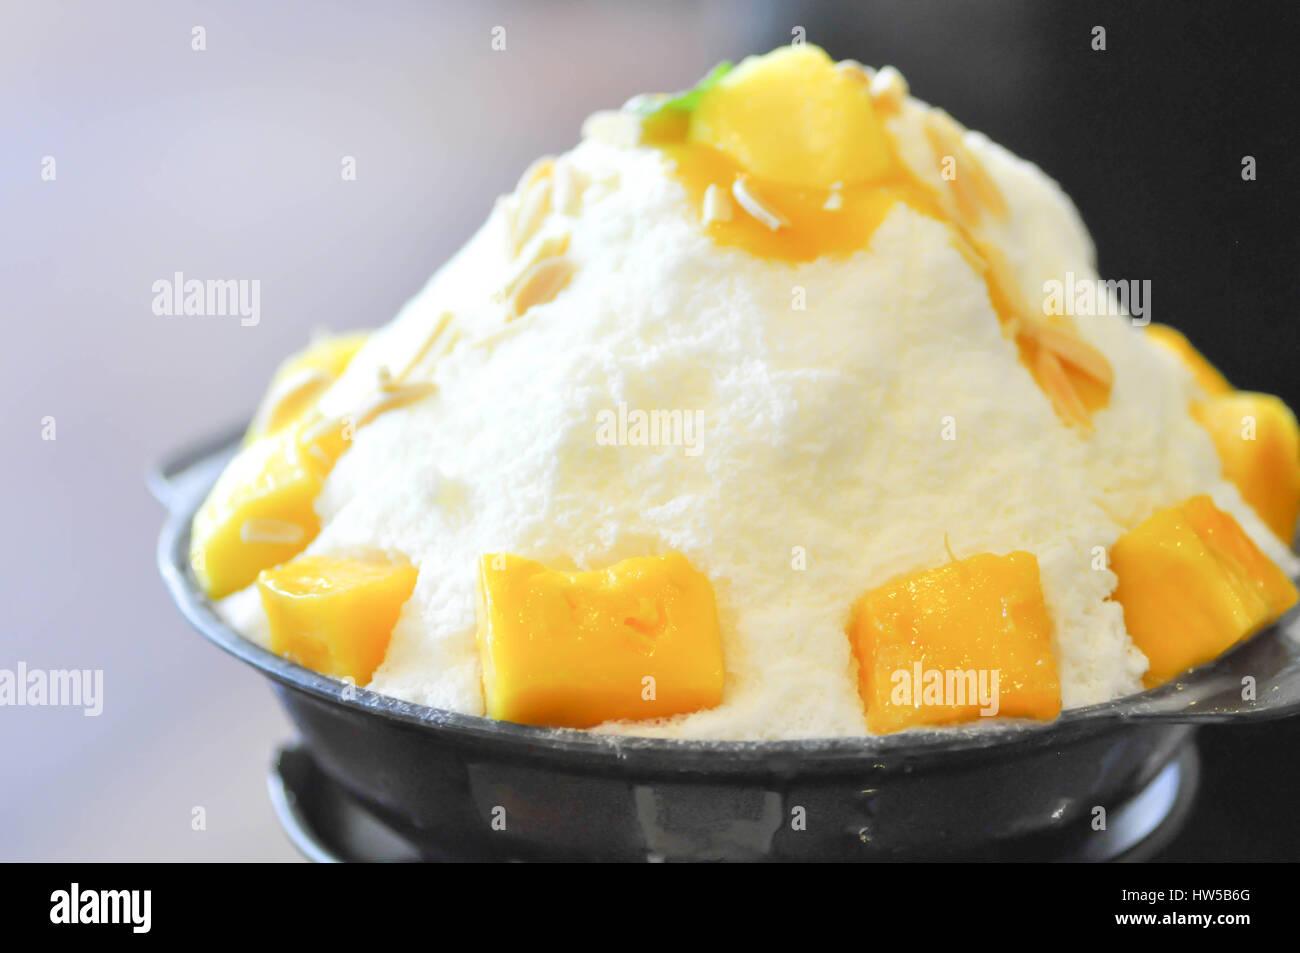 Mango Bingsu Korean Dessert Stock Photo 135957544 Alamy